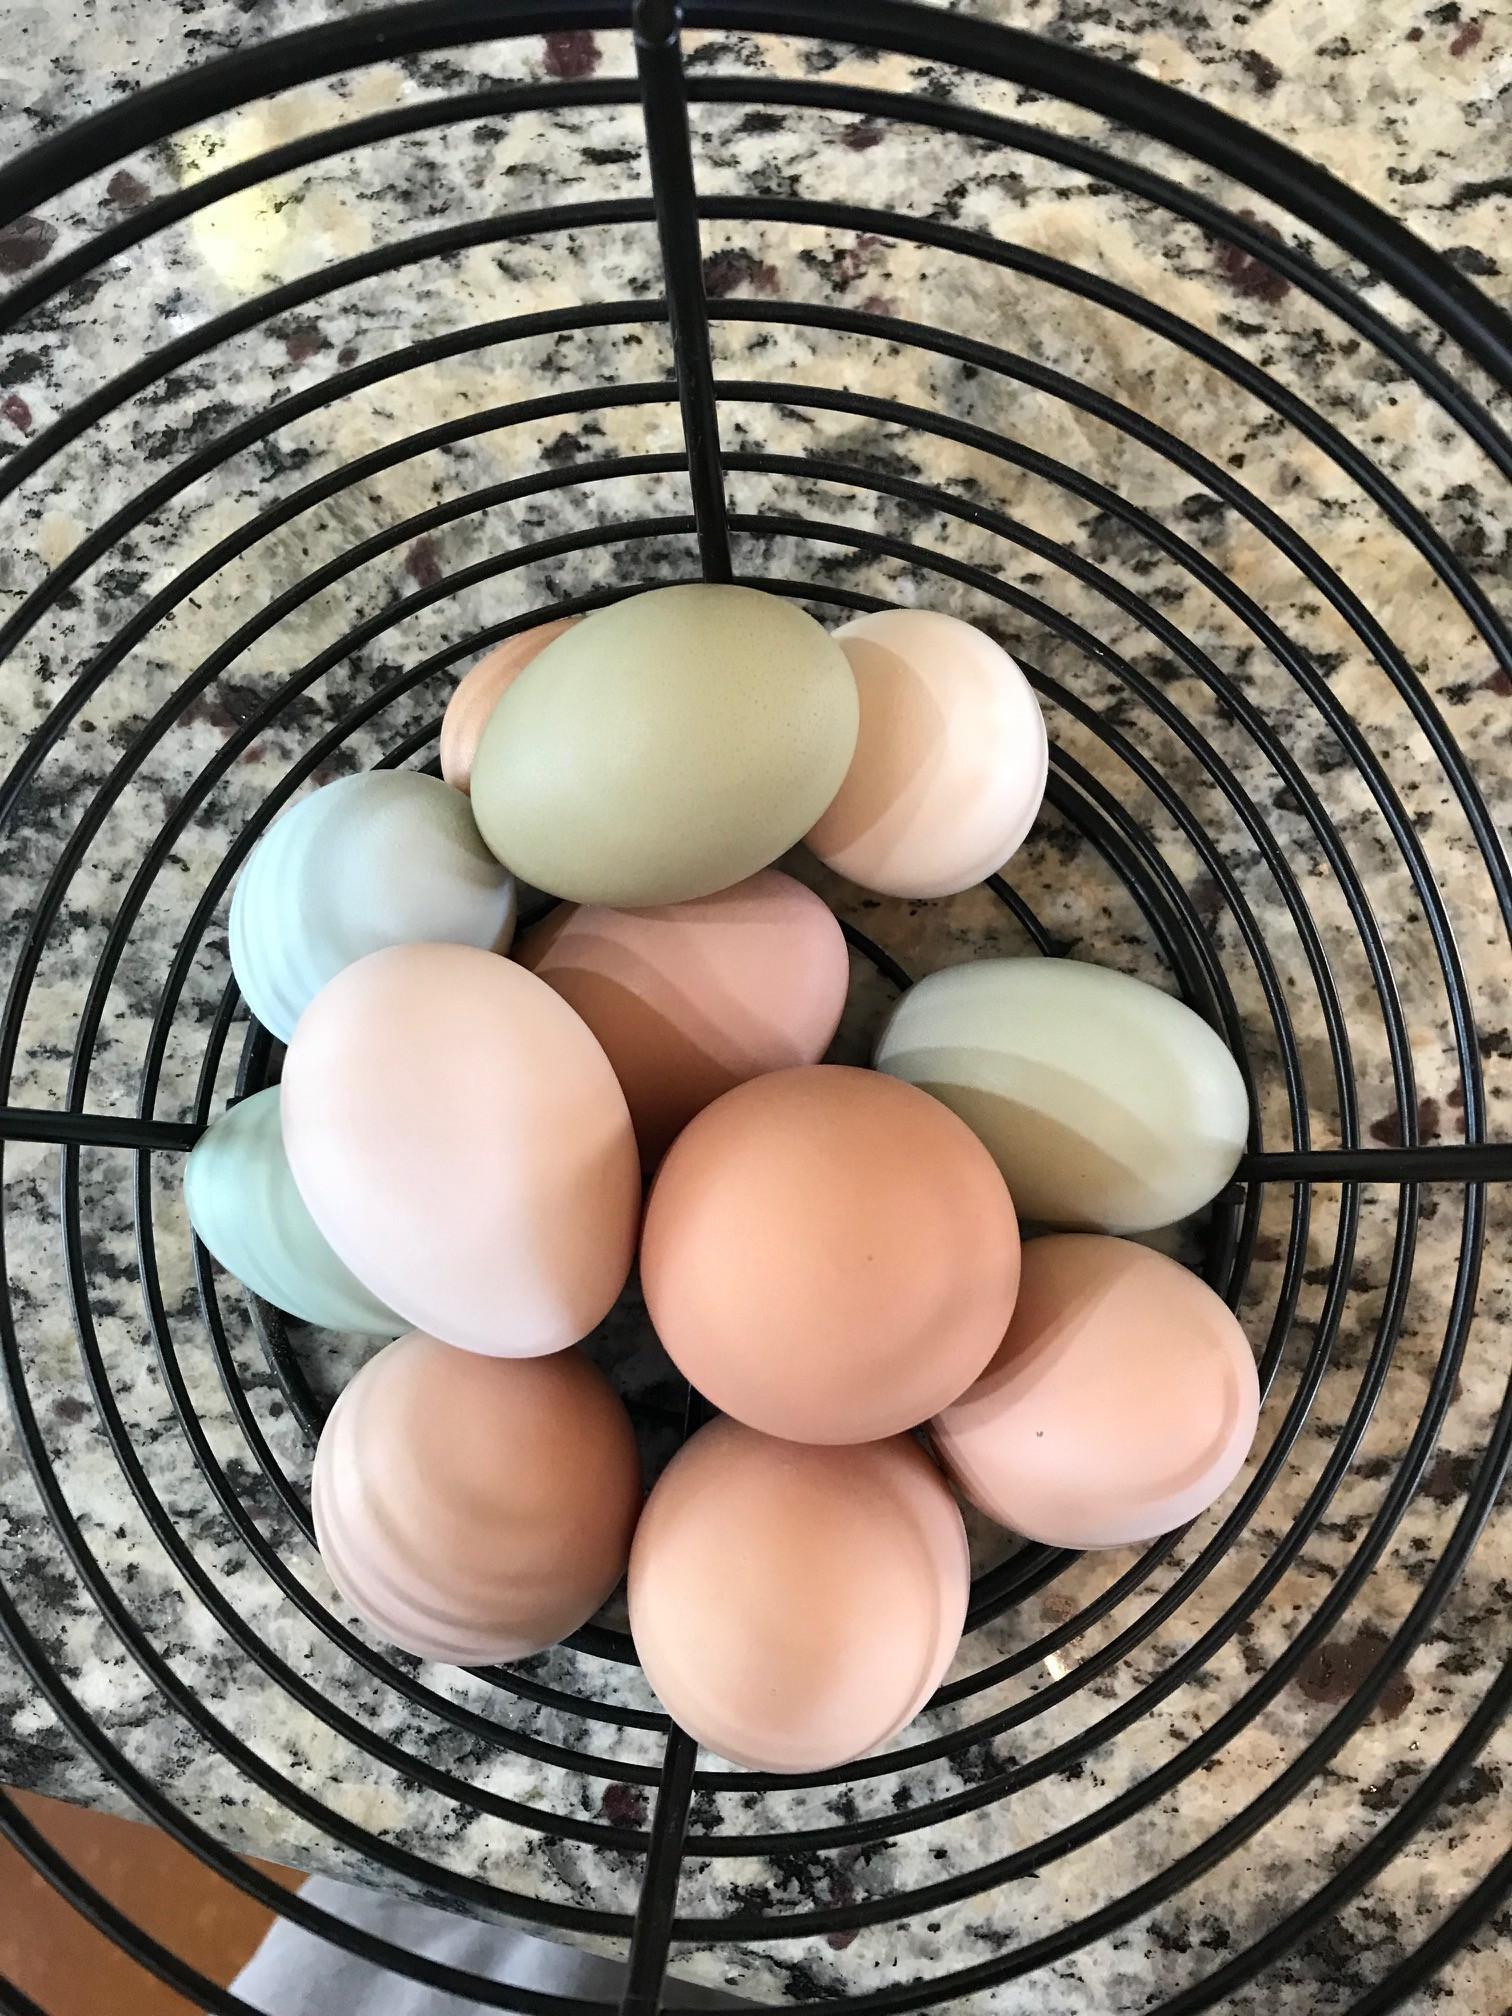 One Dozen Free Range Eggs